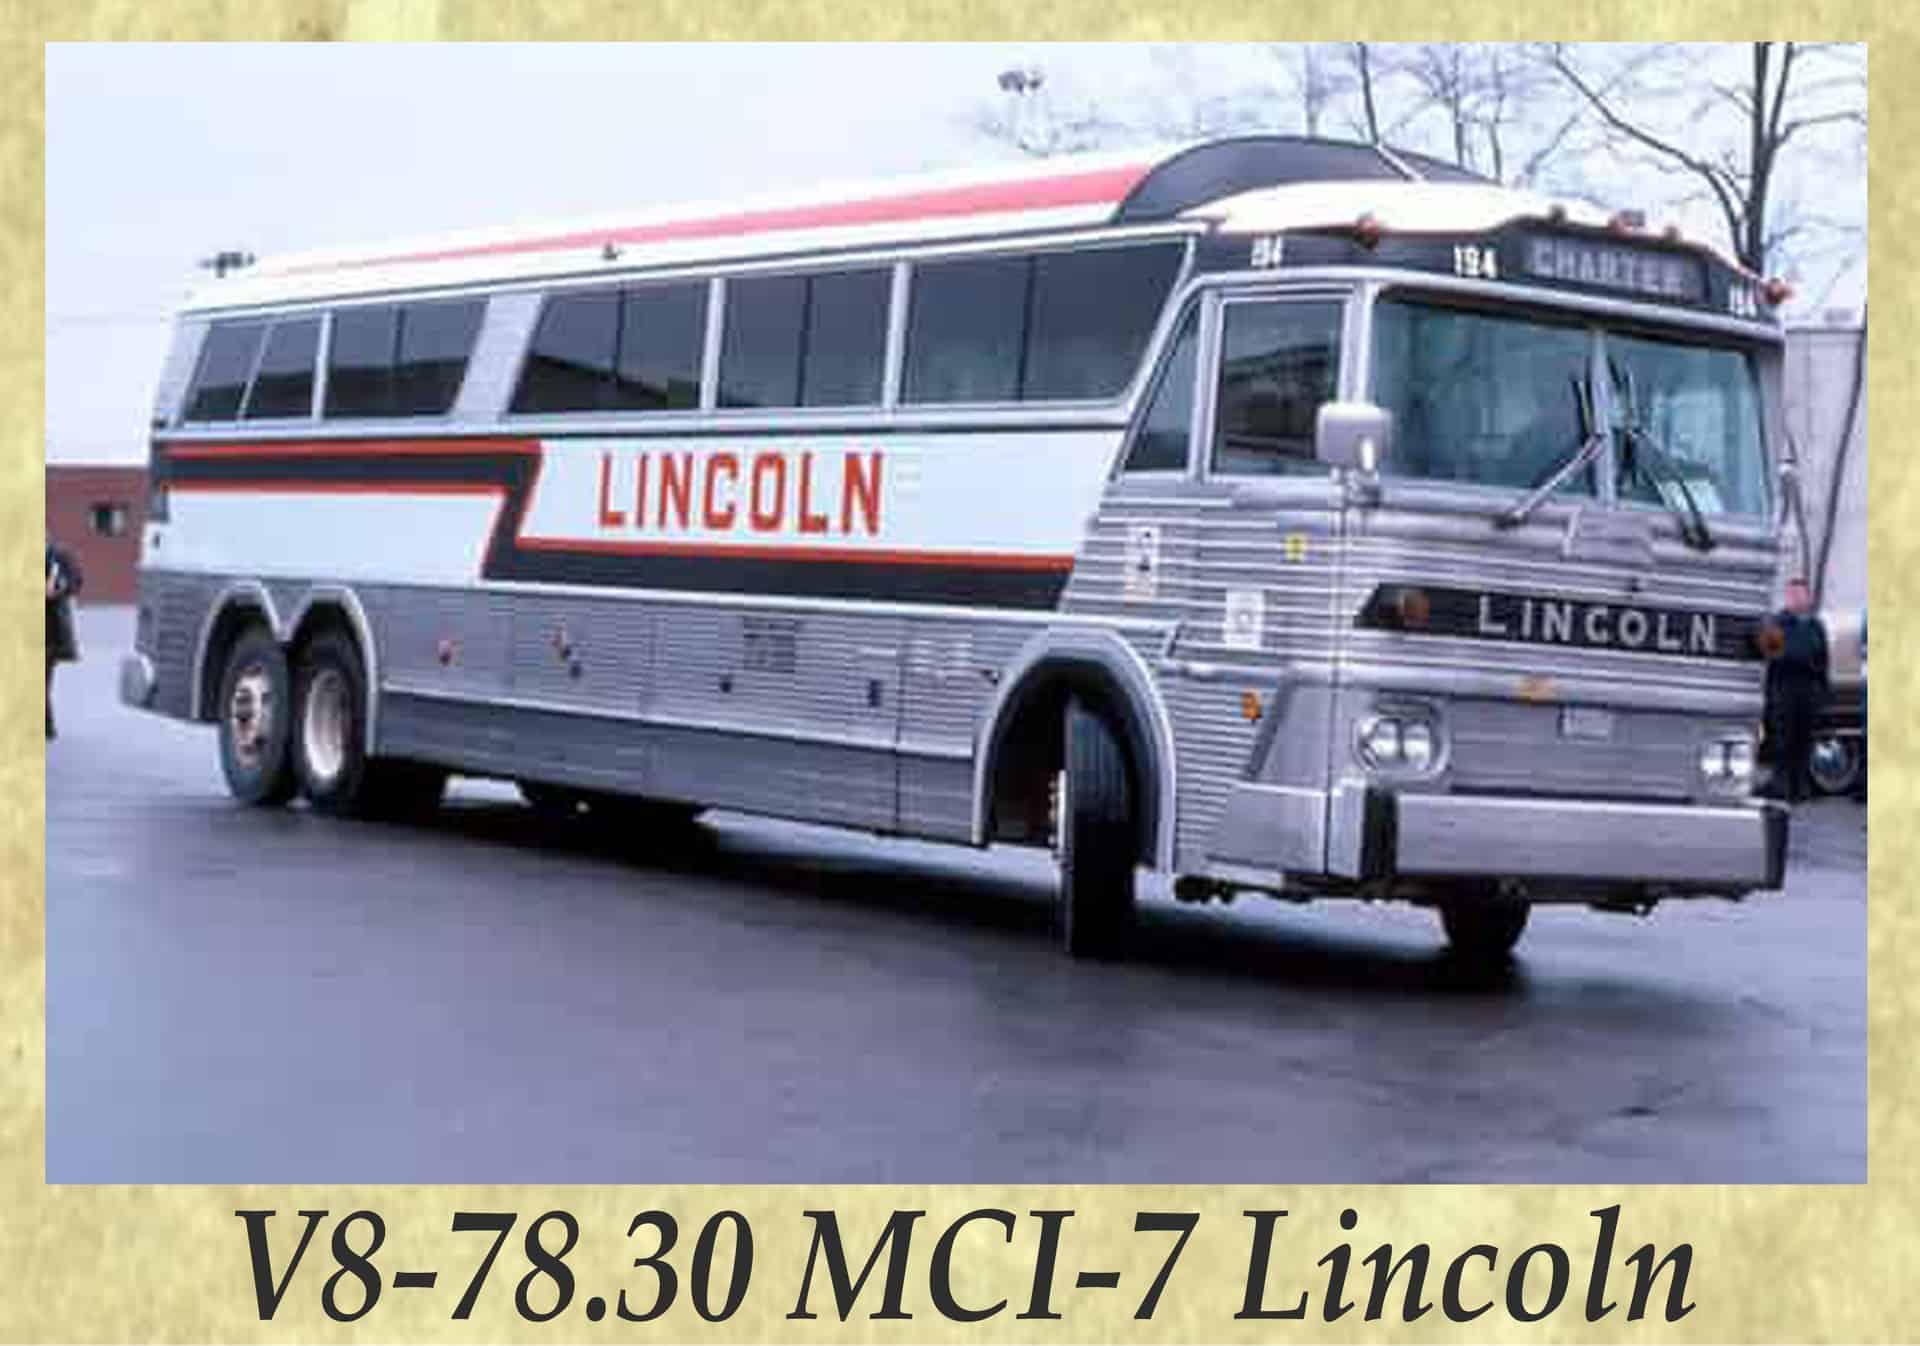 V8-78.30 MCI-7 Lincoln